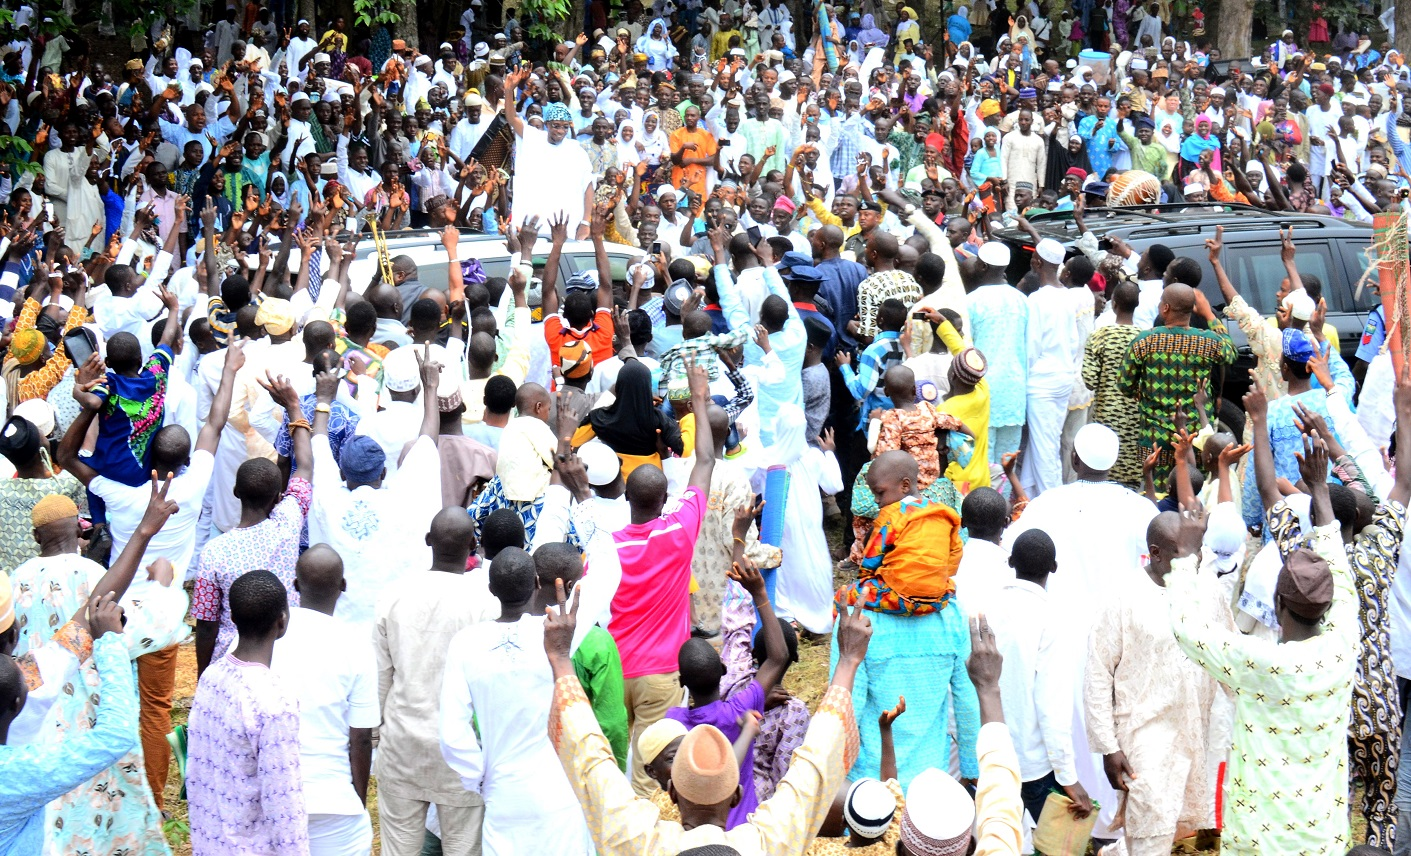 Aregbesola at 2015 Eid-el-fitri 2